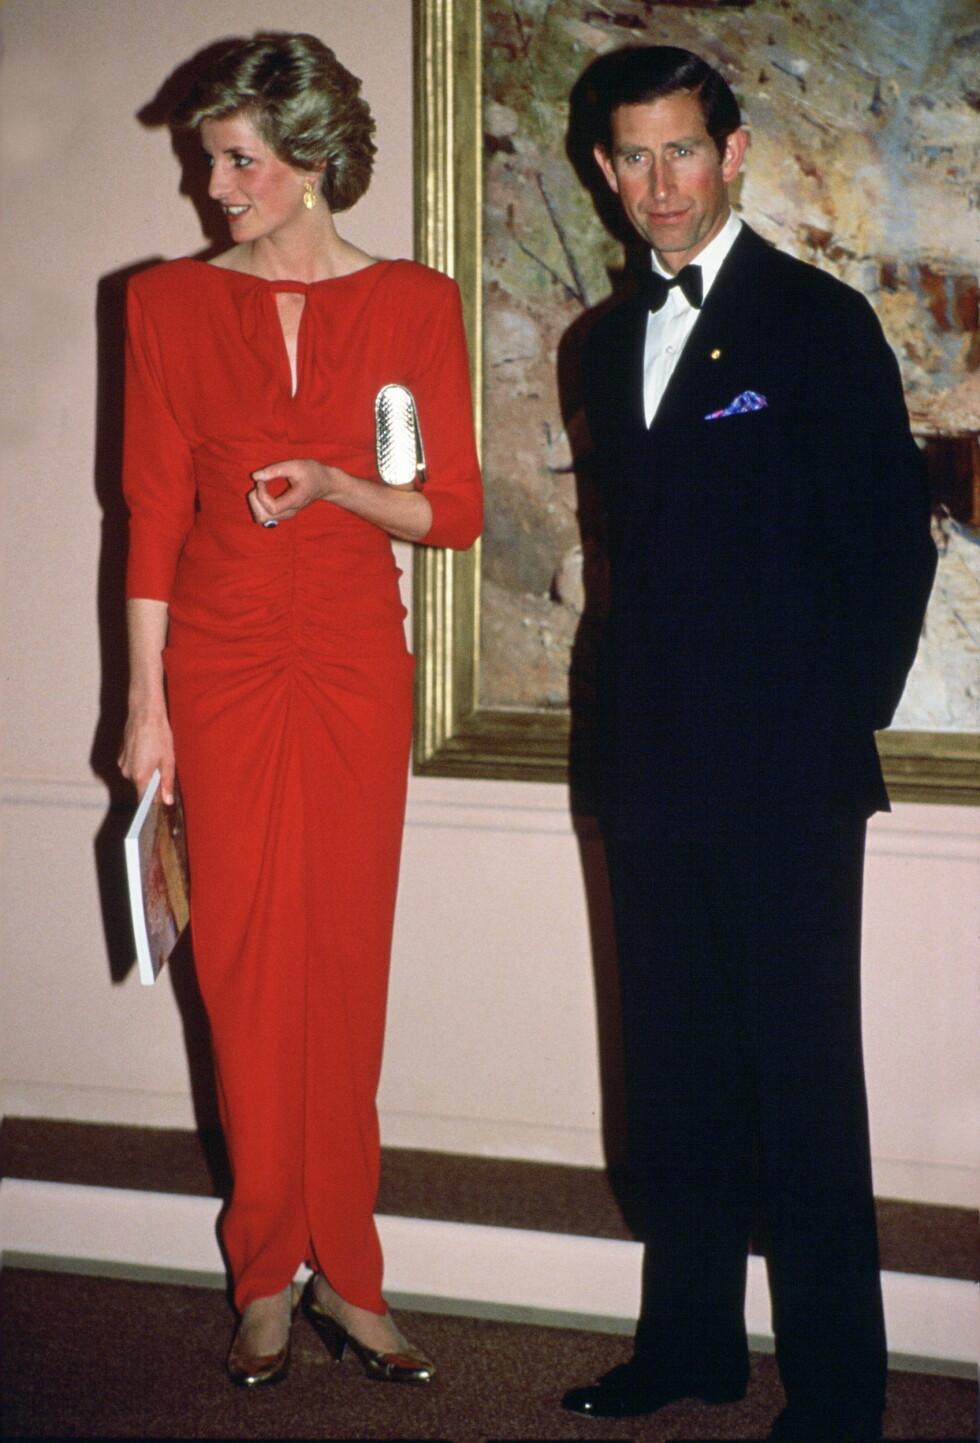 Prinsesse Diana og prins Charles. Foto: Ap